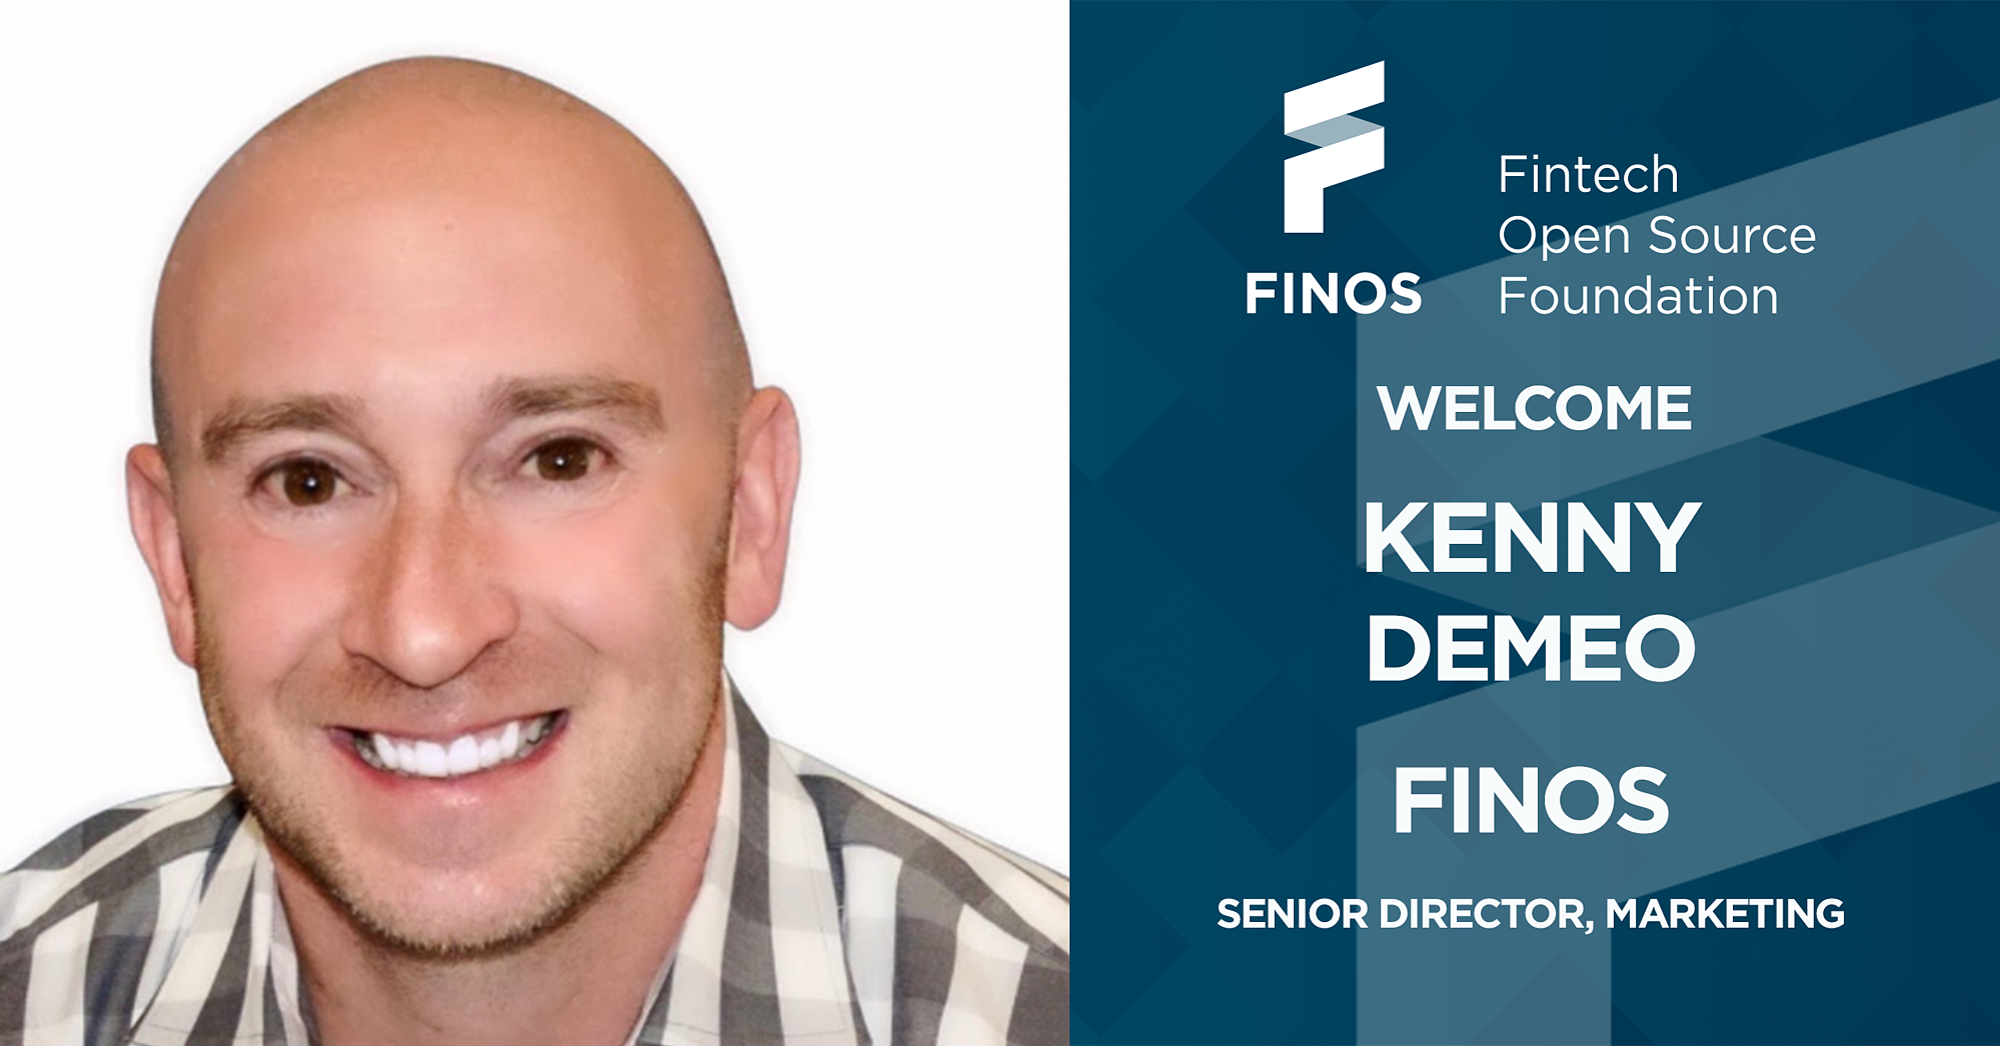 kenny-demeo-1